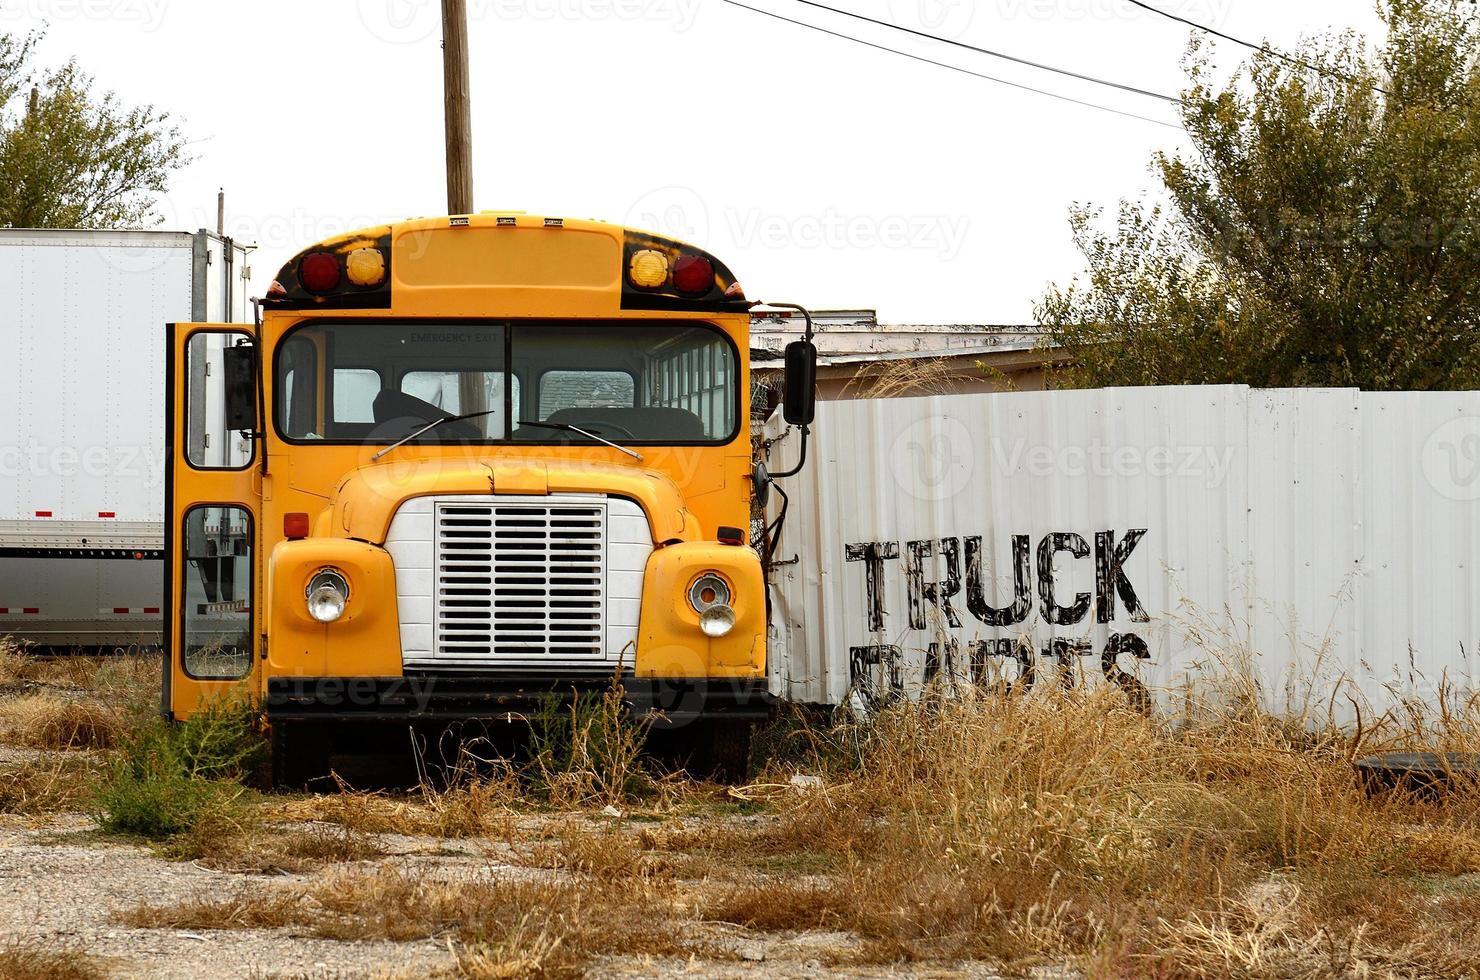 oude bus foto